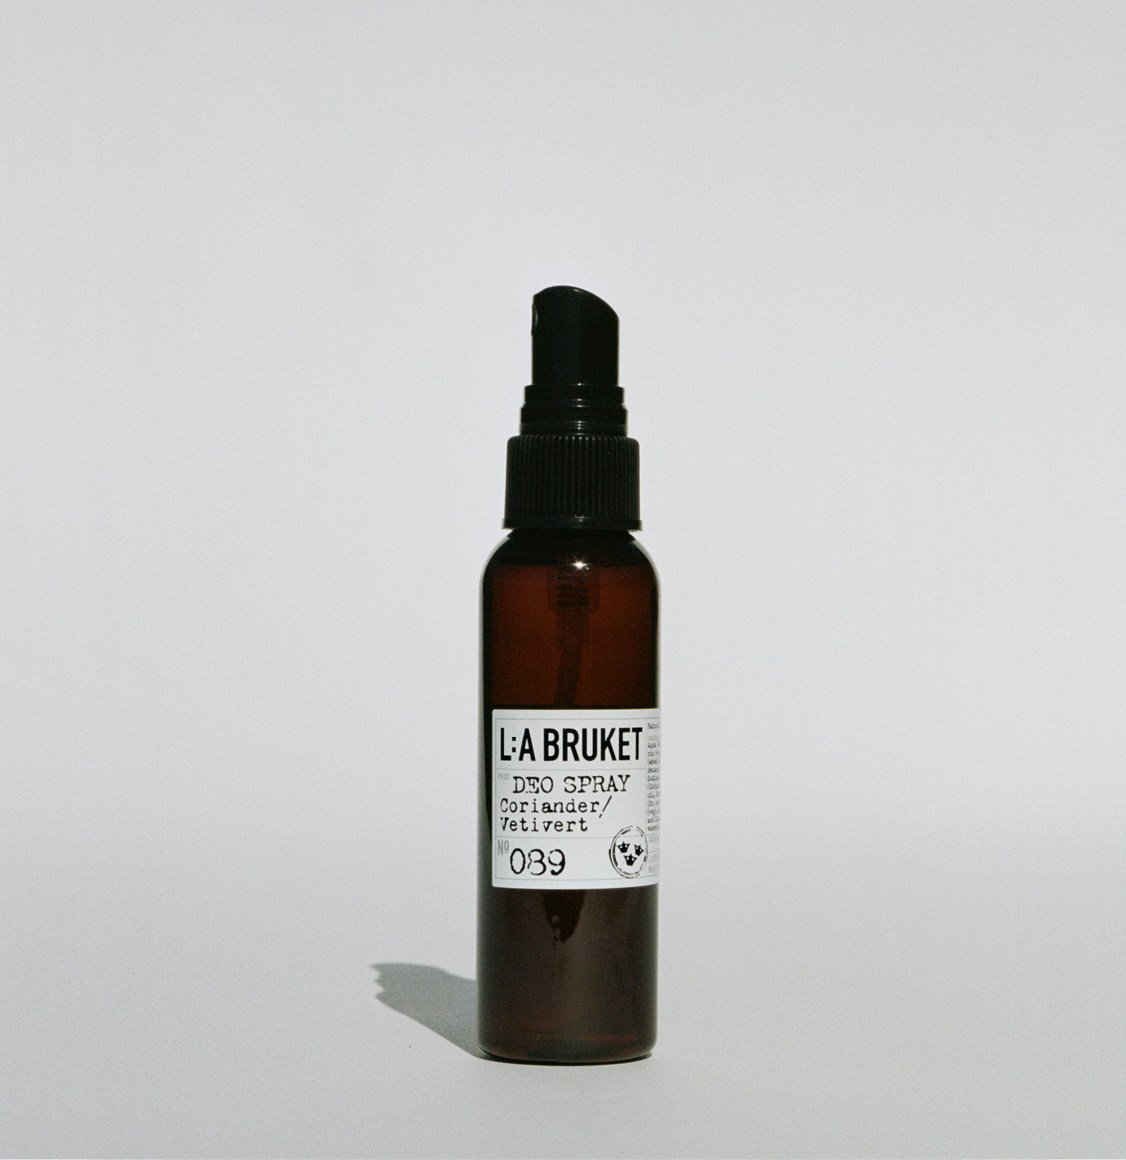 LA Bruket 089 Αποσμητικό Spray Coriander and Vetiver 55ml